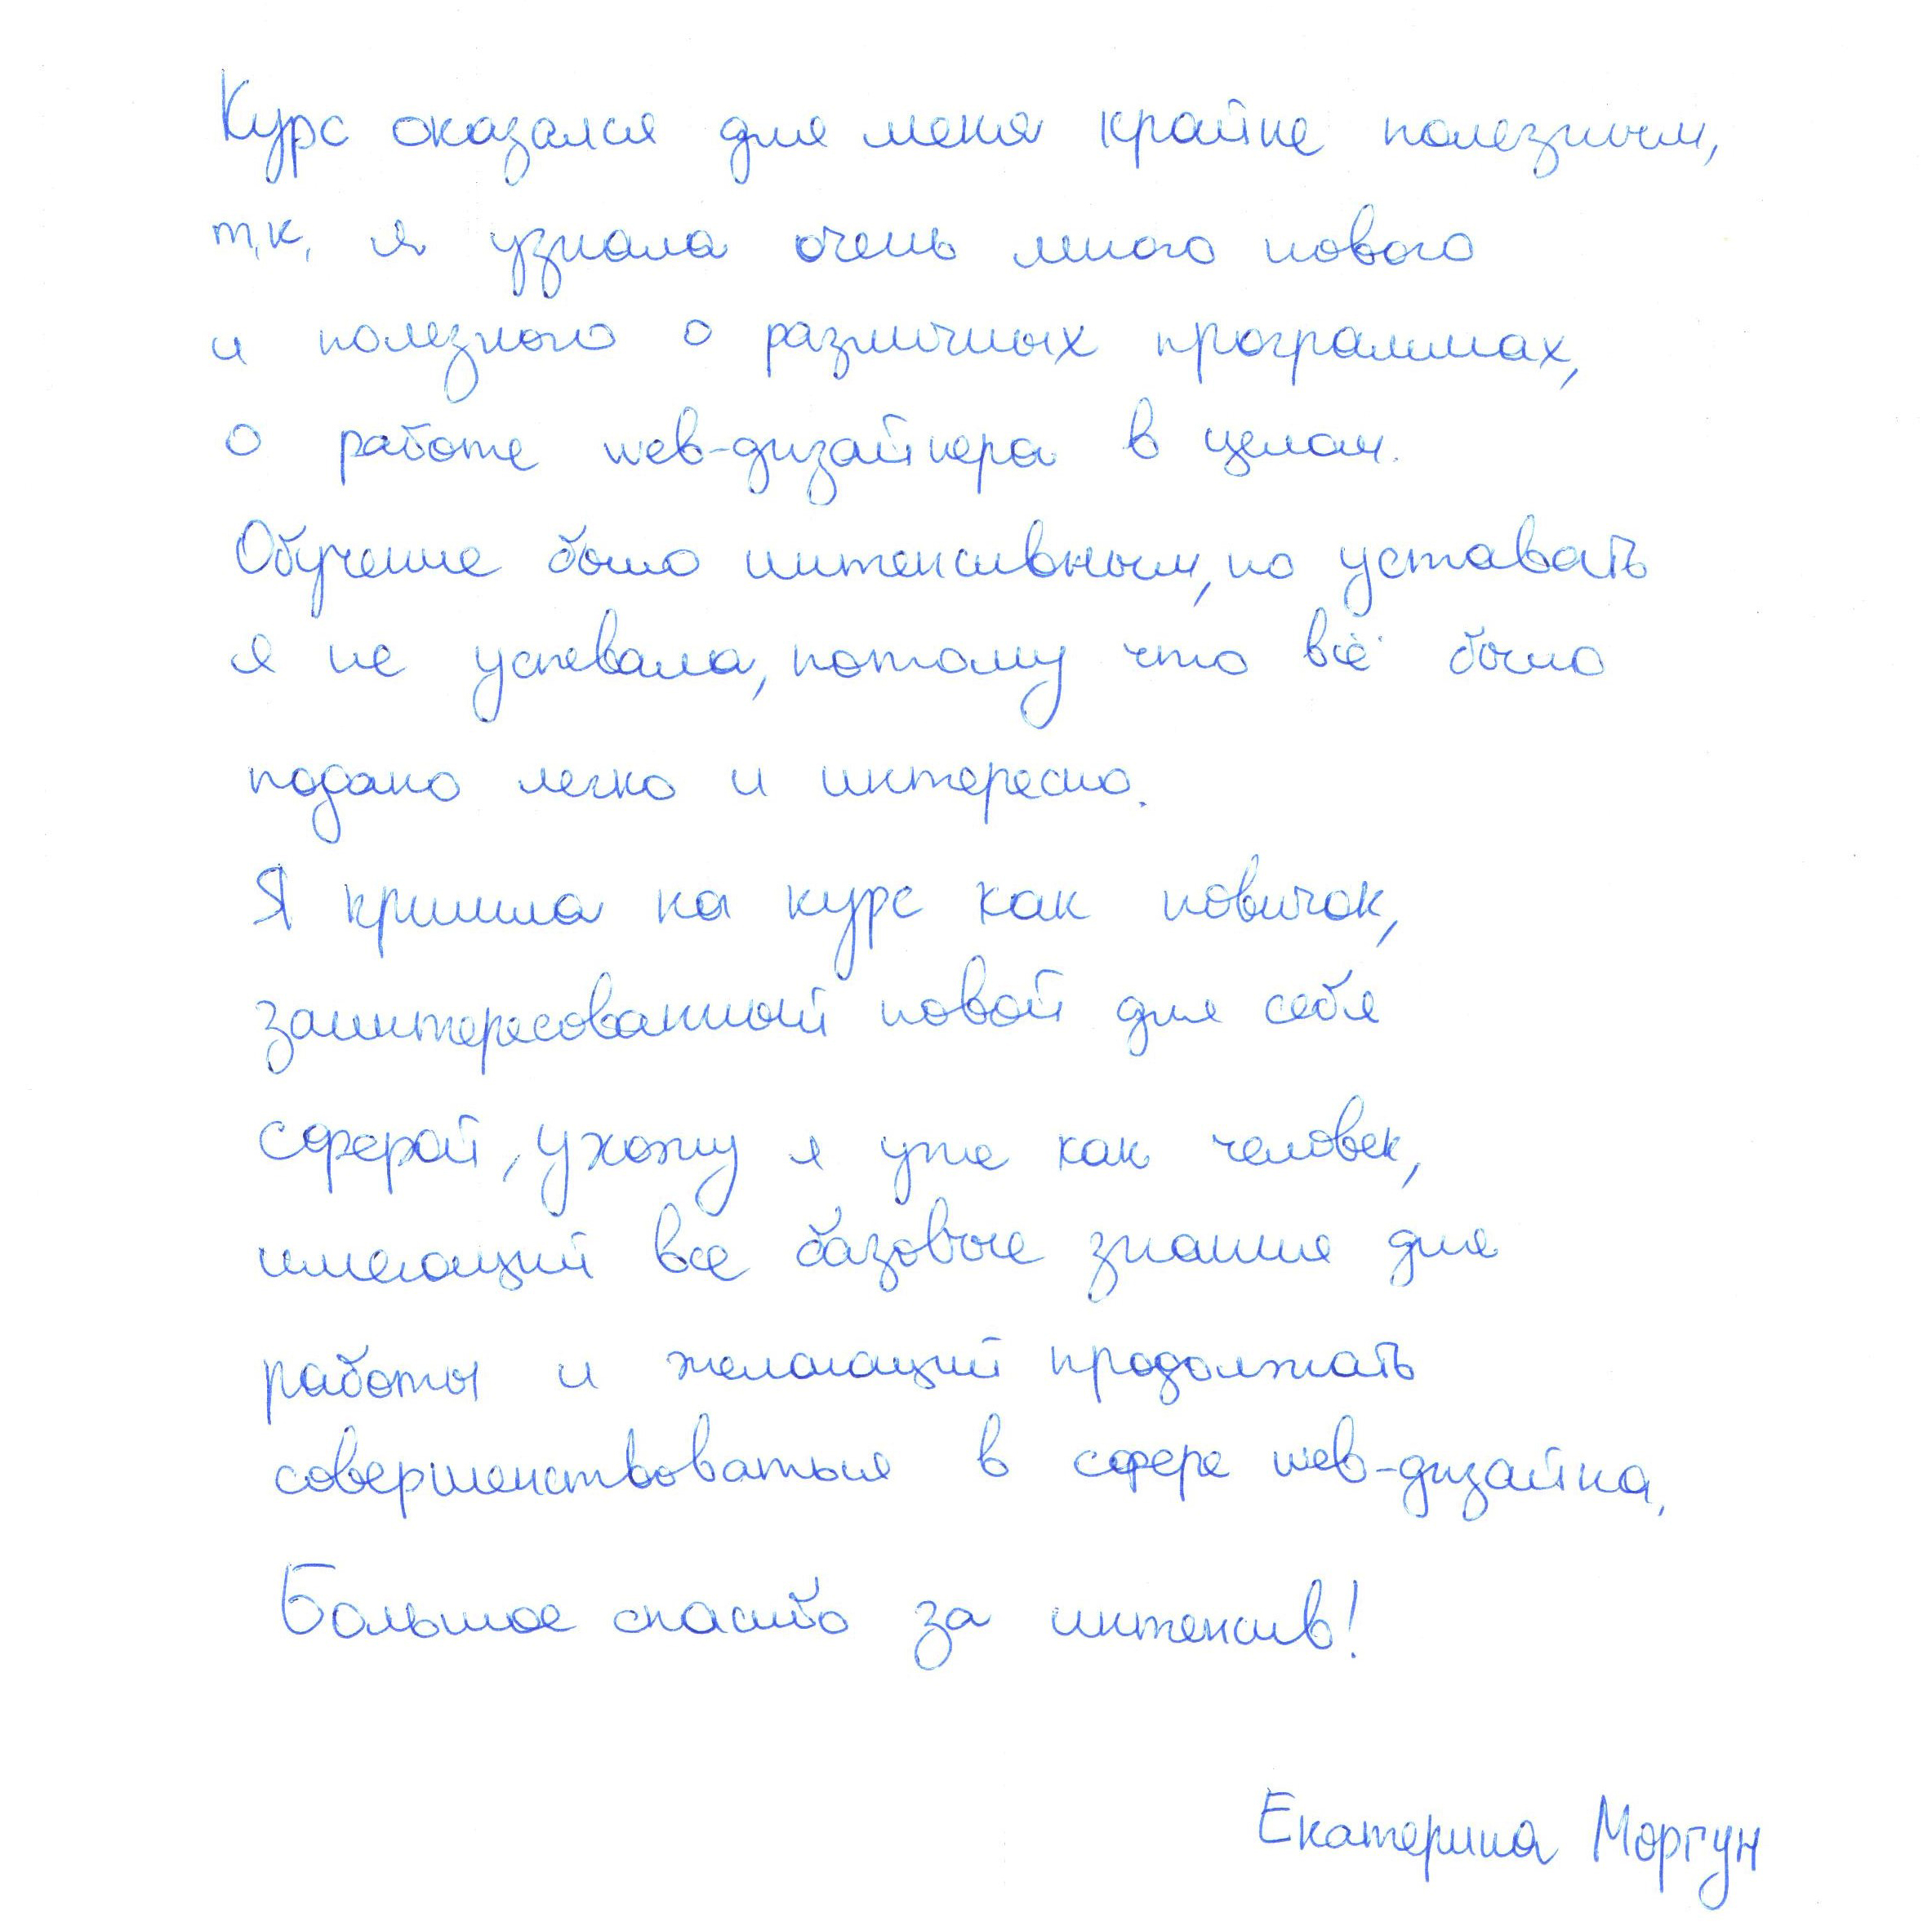 отзыв об интенсиве Данила Фимушкина в Самаре студентки Екатерины Моргун